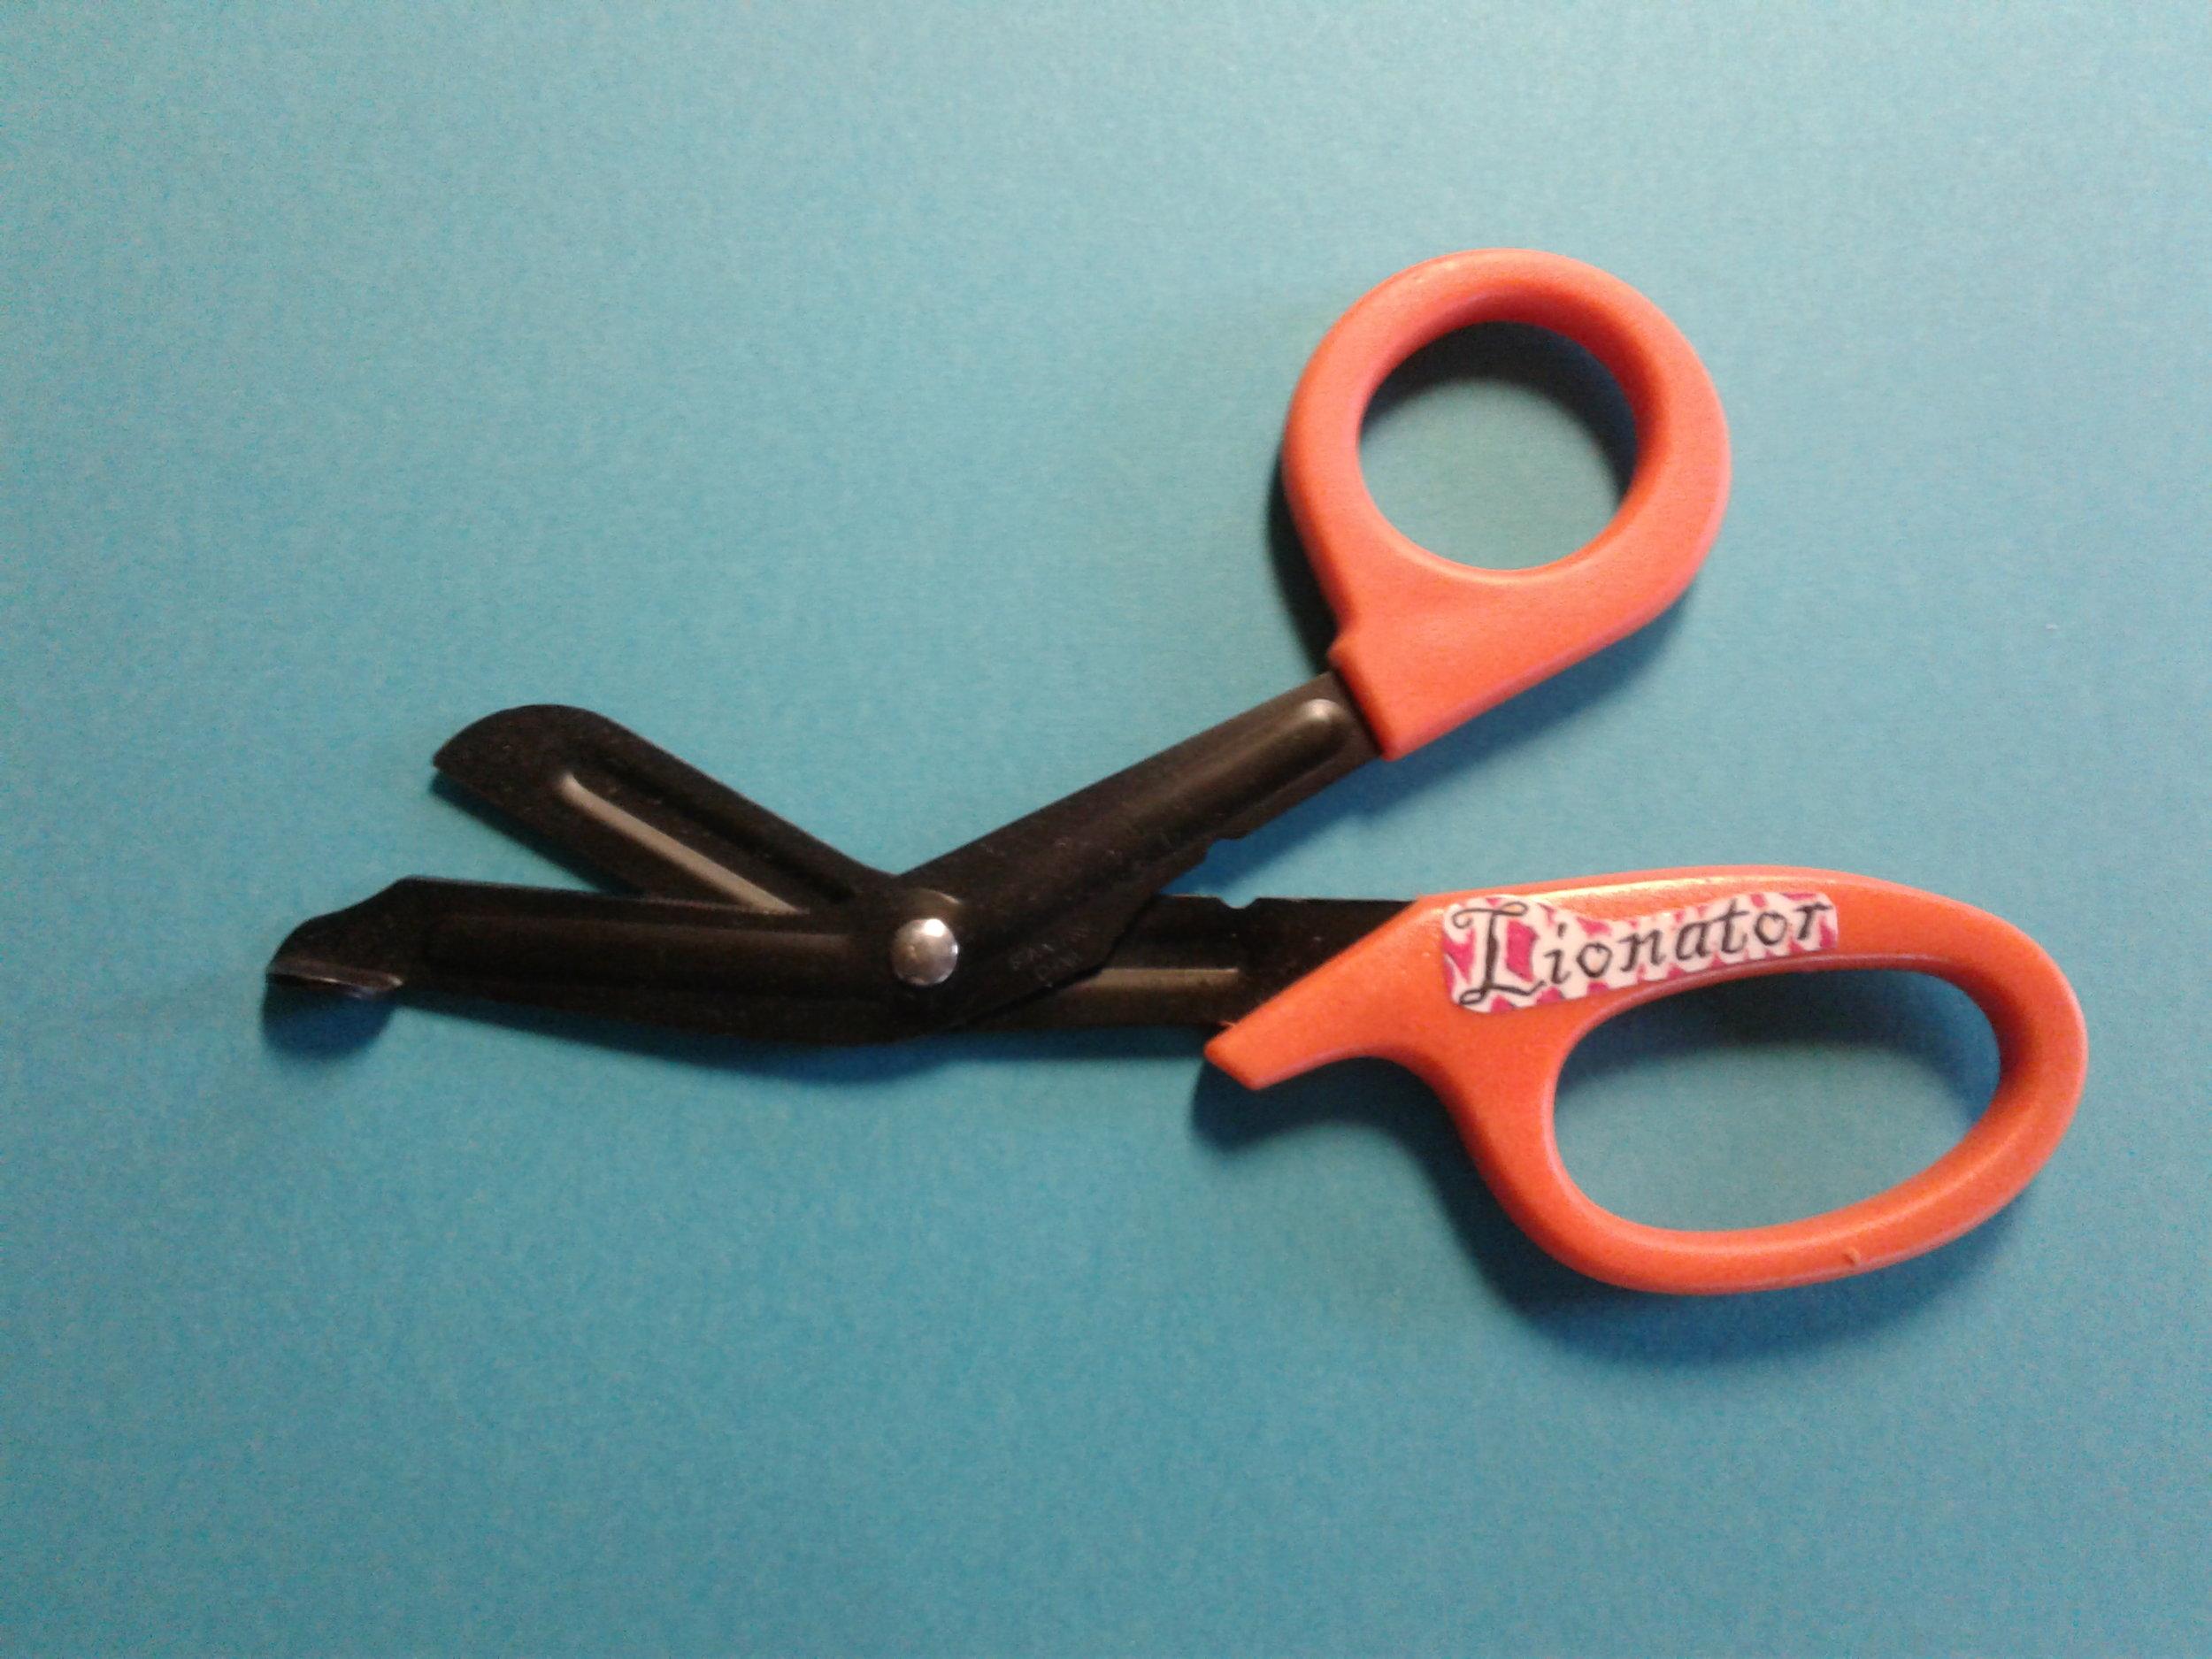 lionator scissors.jpg